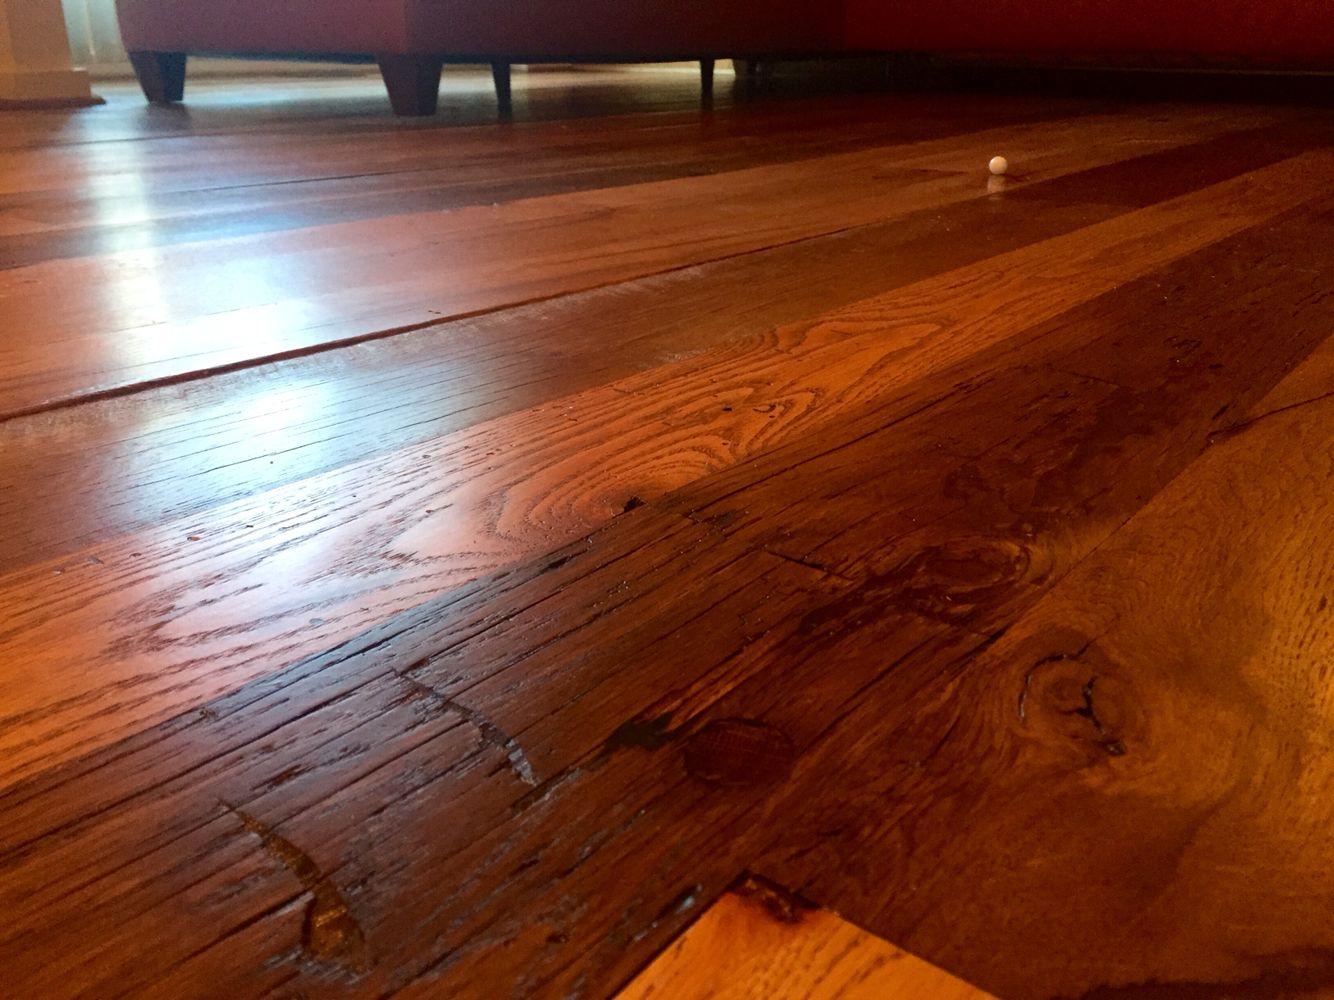 Floor Refinishing Reclaimed White And Red Oak Mix Finished With Bona Dts Sealer And 2coats Of Bona